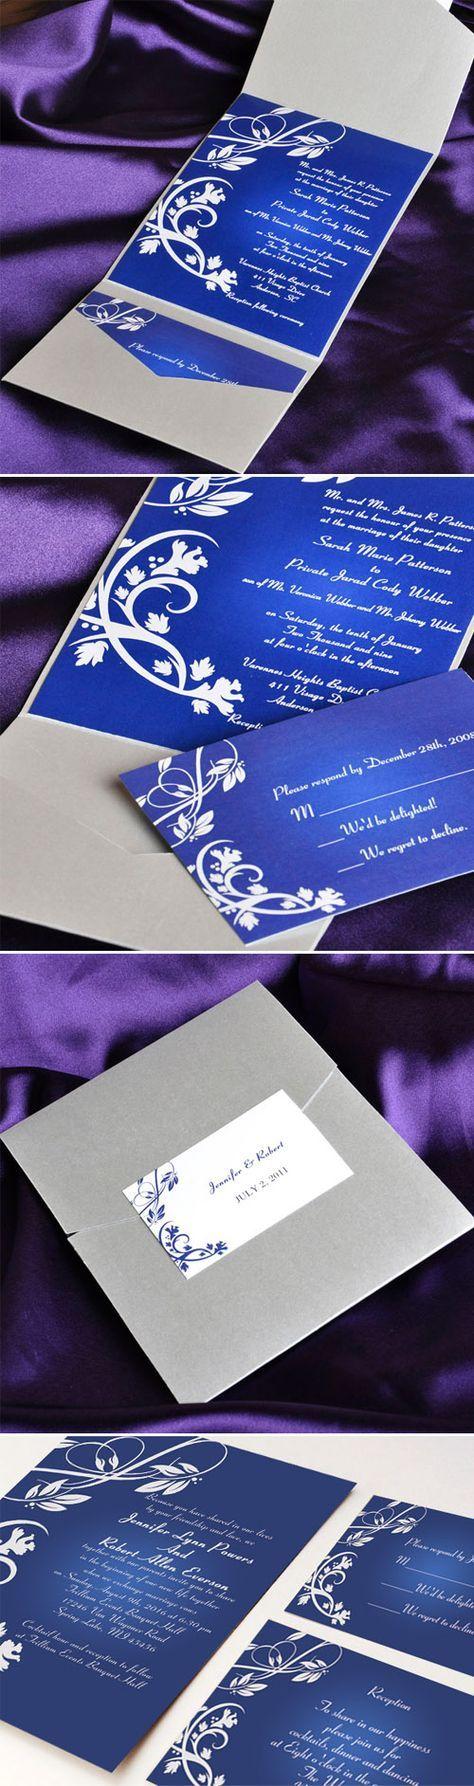 best 25 royal blue centerpieces ideas on pinterest royal blue wedding decorations royal blue. Black Bedroom Furniture Sets. Home Design Ideas